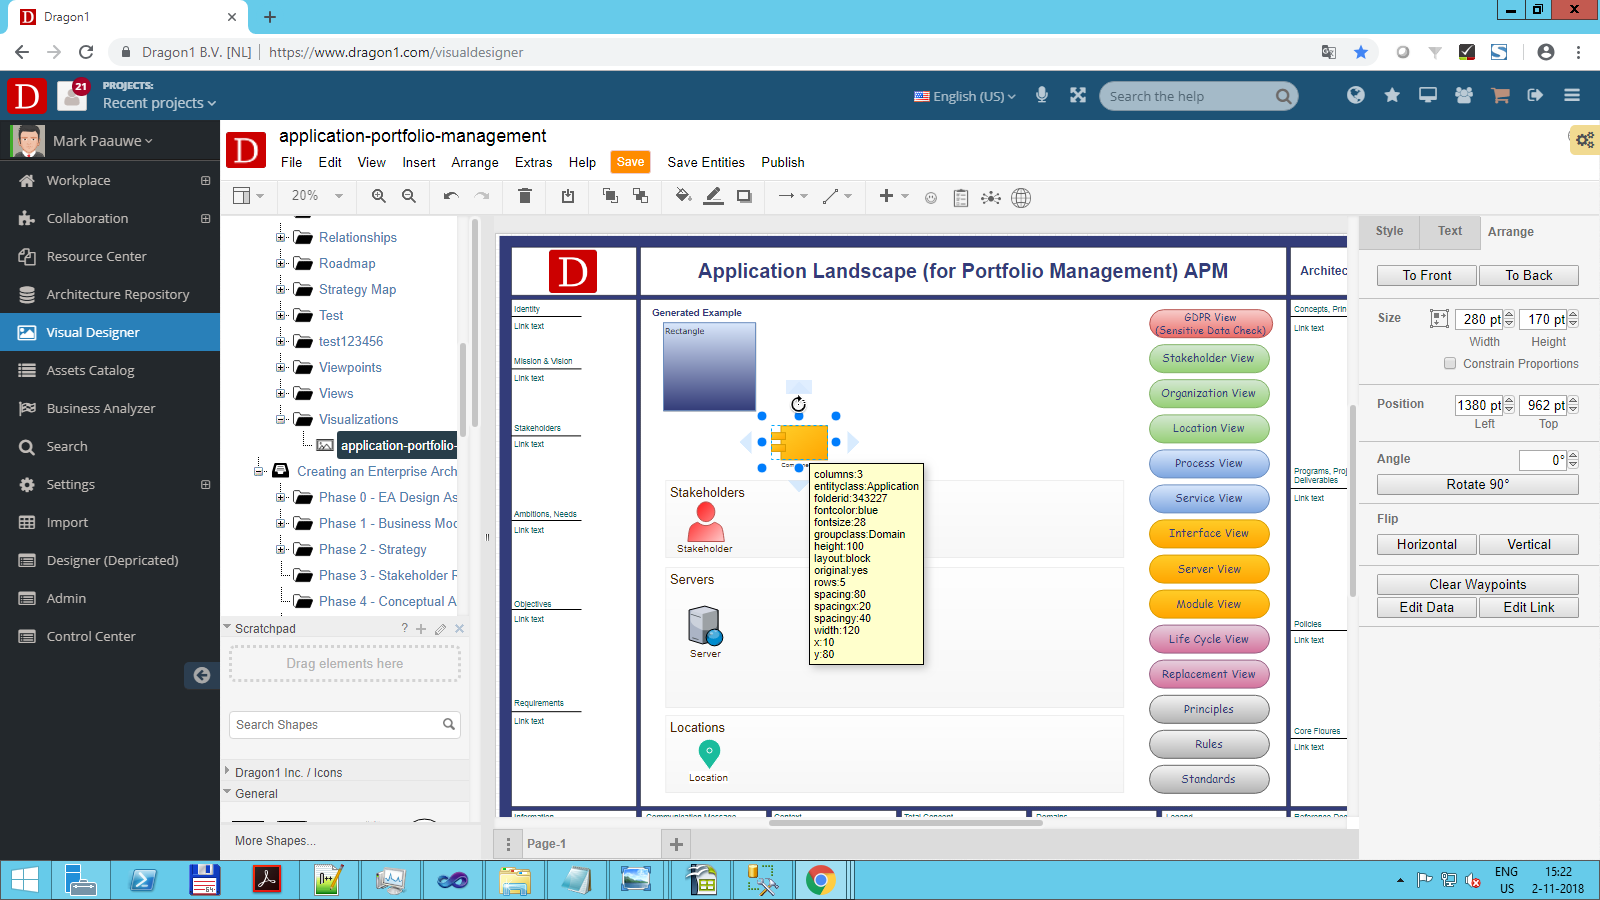 dragon1 application portfolio management visualization template